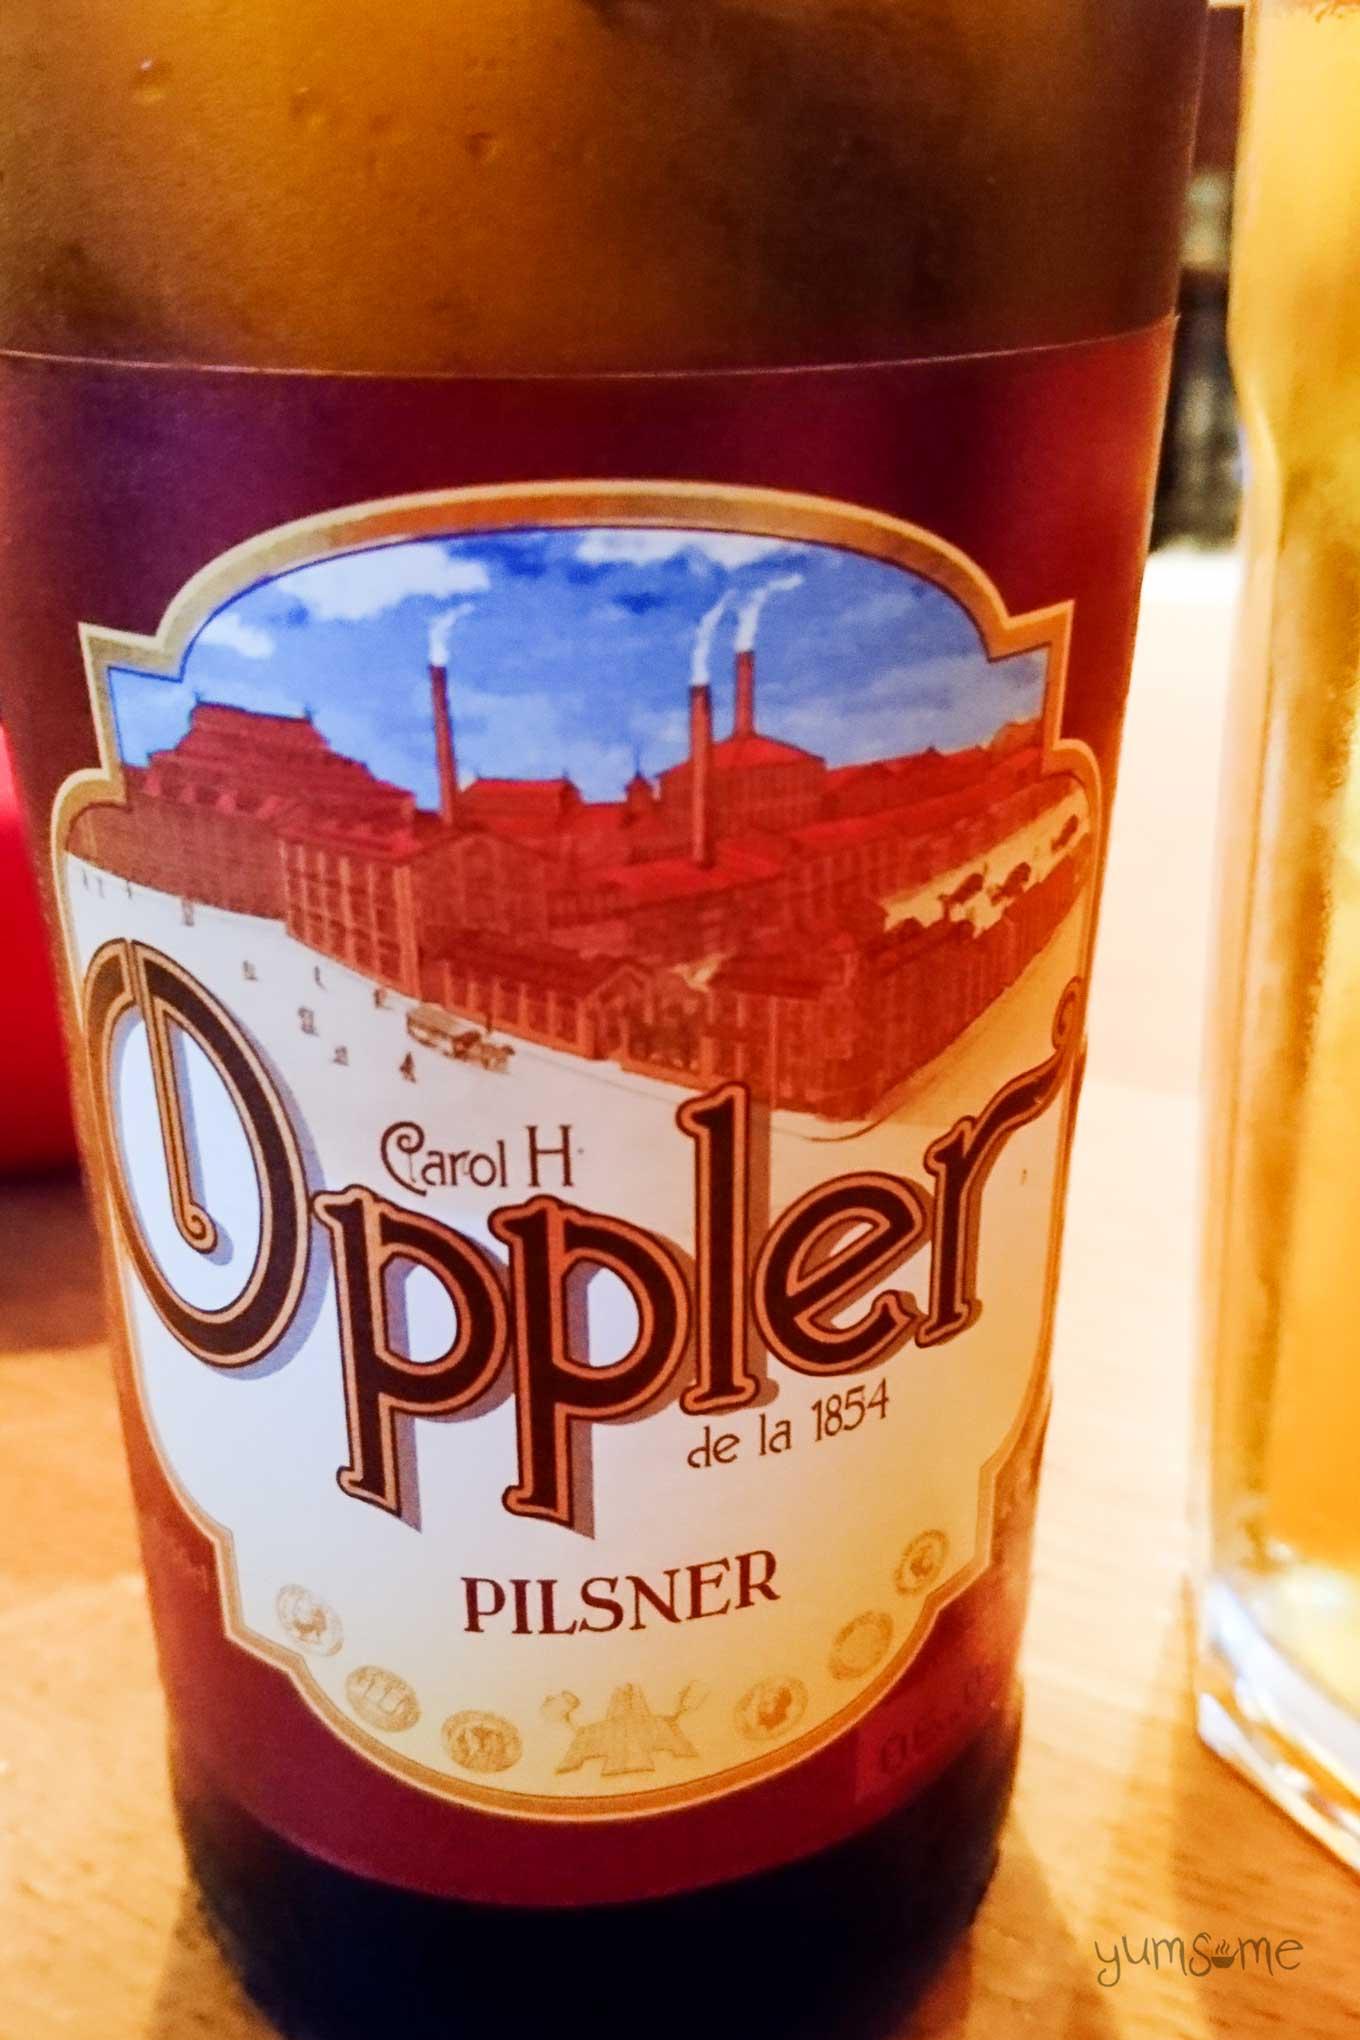 oppler pilsner | yumsome.com